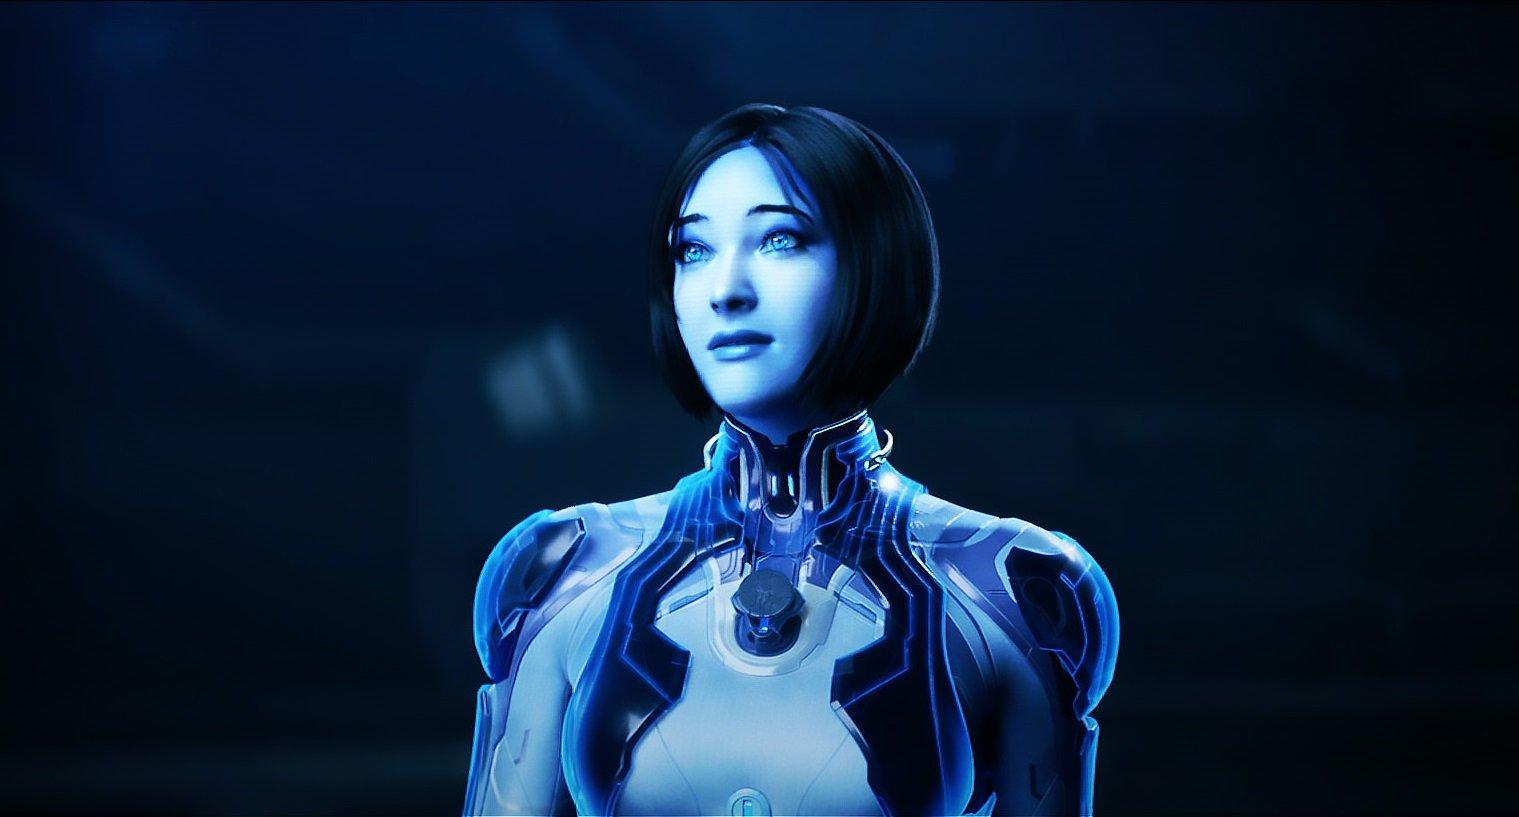 Natascha McElhone jouera Cortana dans Halo TV series